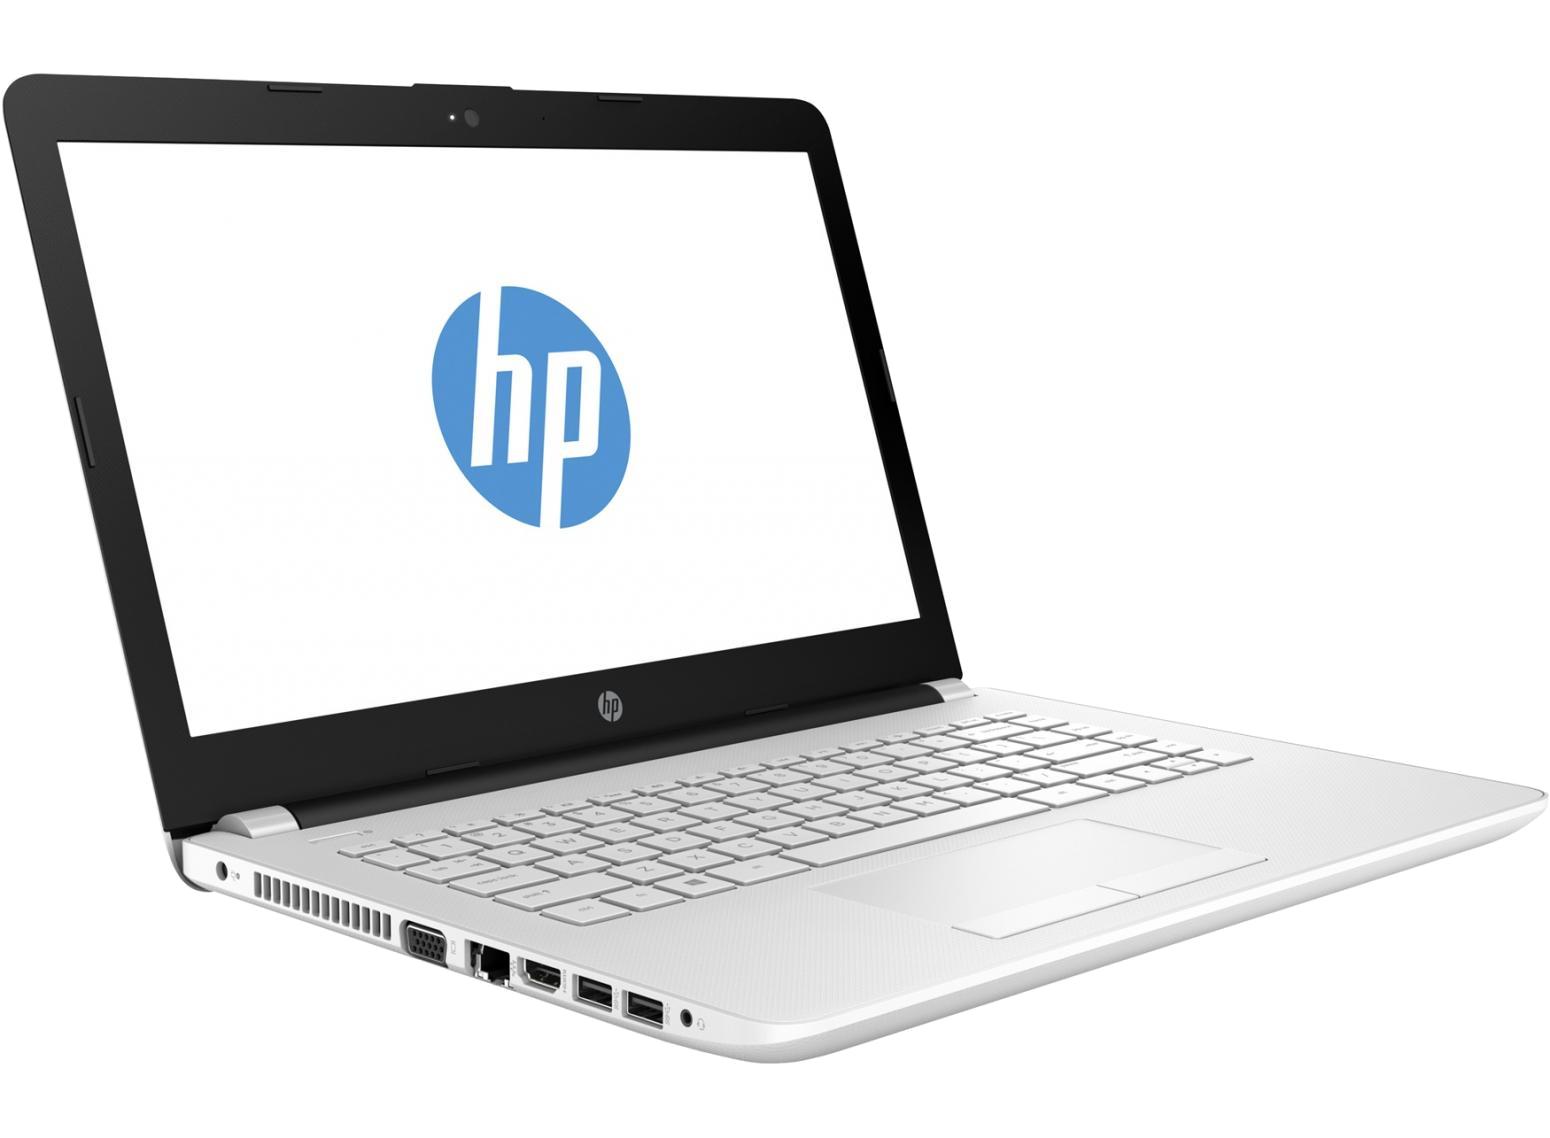 Image HP Laptop 14-bw018nf - Labo FNAC